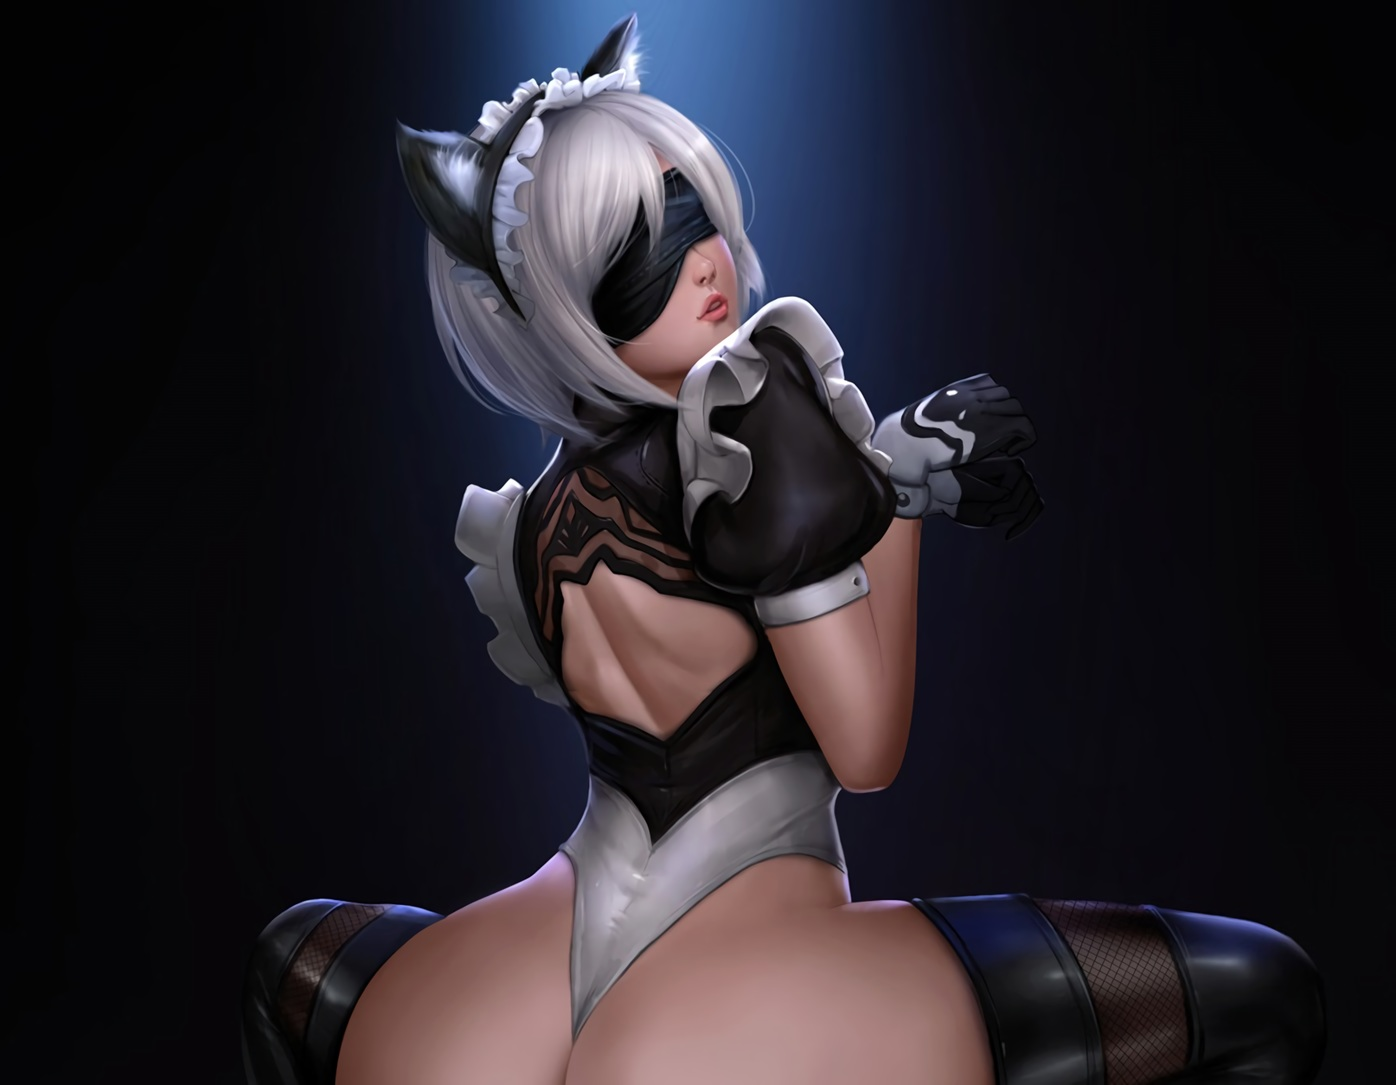 animal_ears ass blindfold boots catgirl cropped felox08 gloves gray_hair headdress leotard nier nier:_automata realistic spread_legs thighhighs waifu2x yorha_unit_no._2_type_b